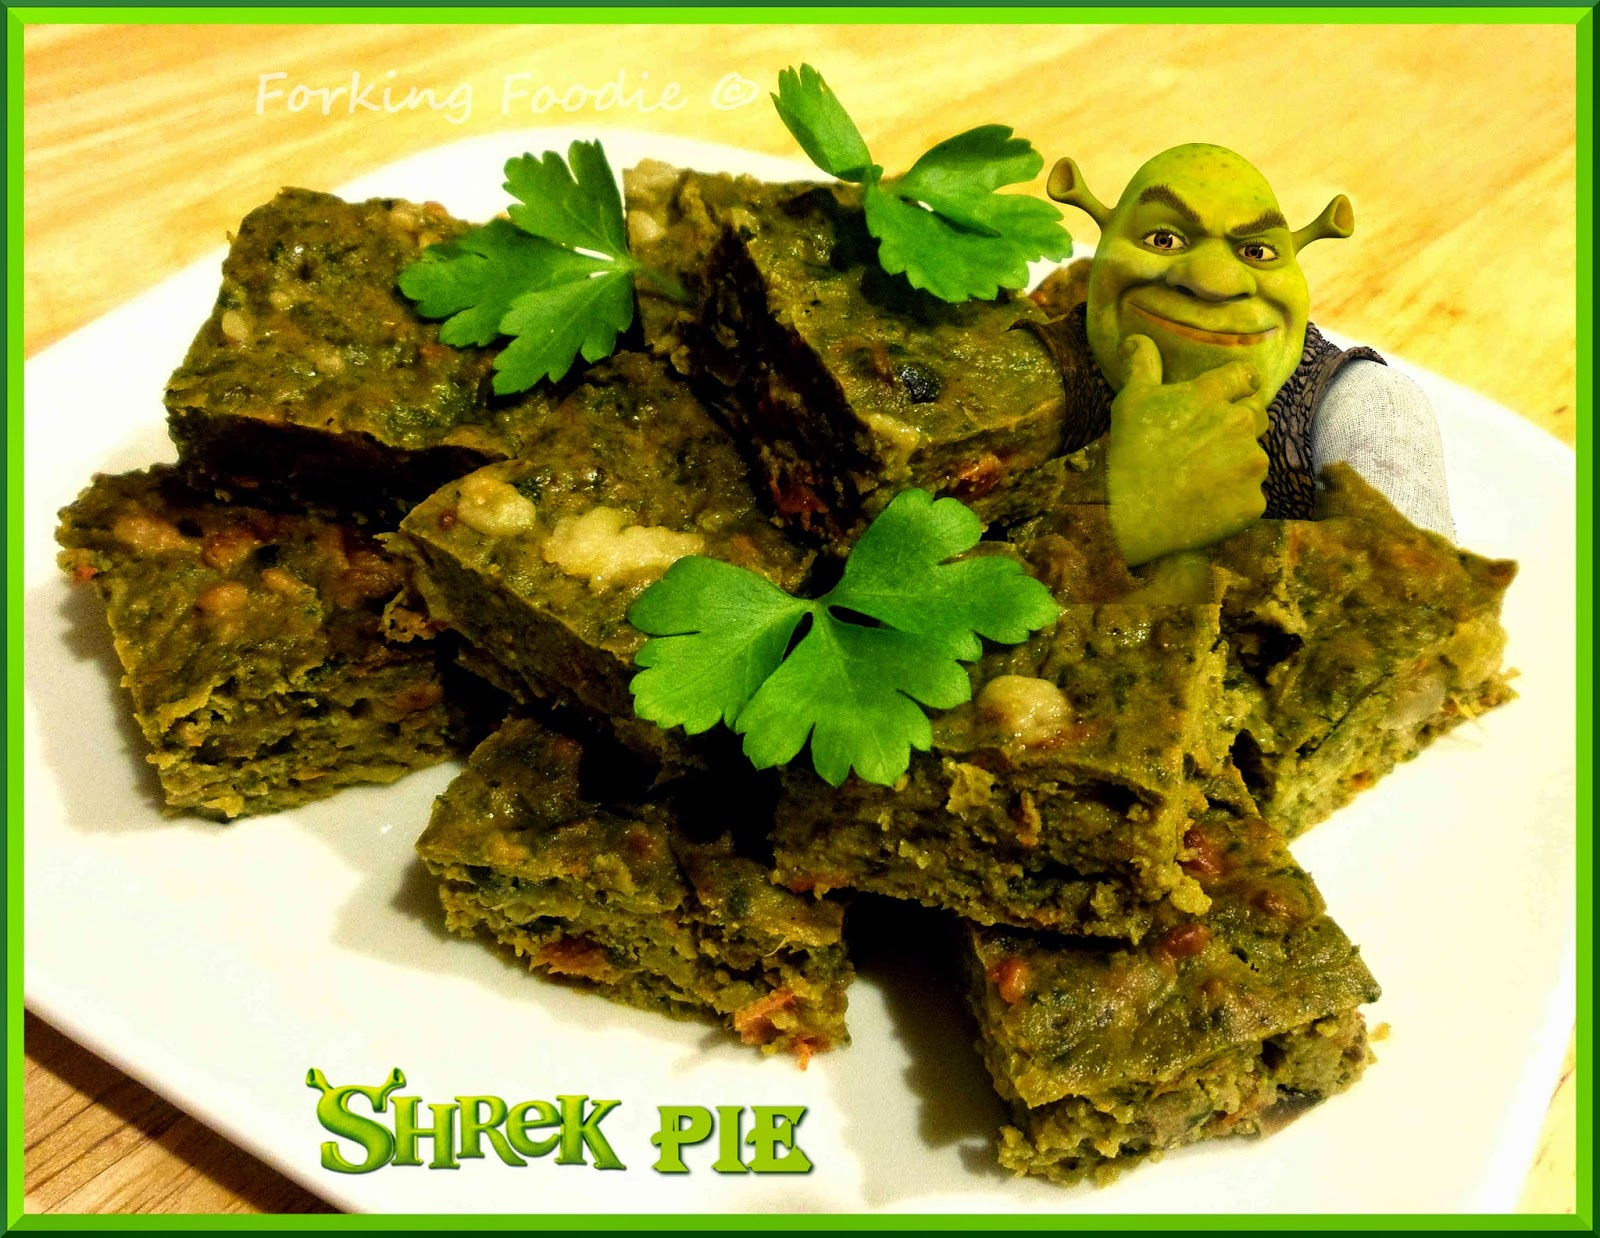 Shrek Pie